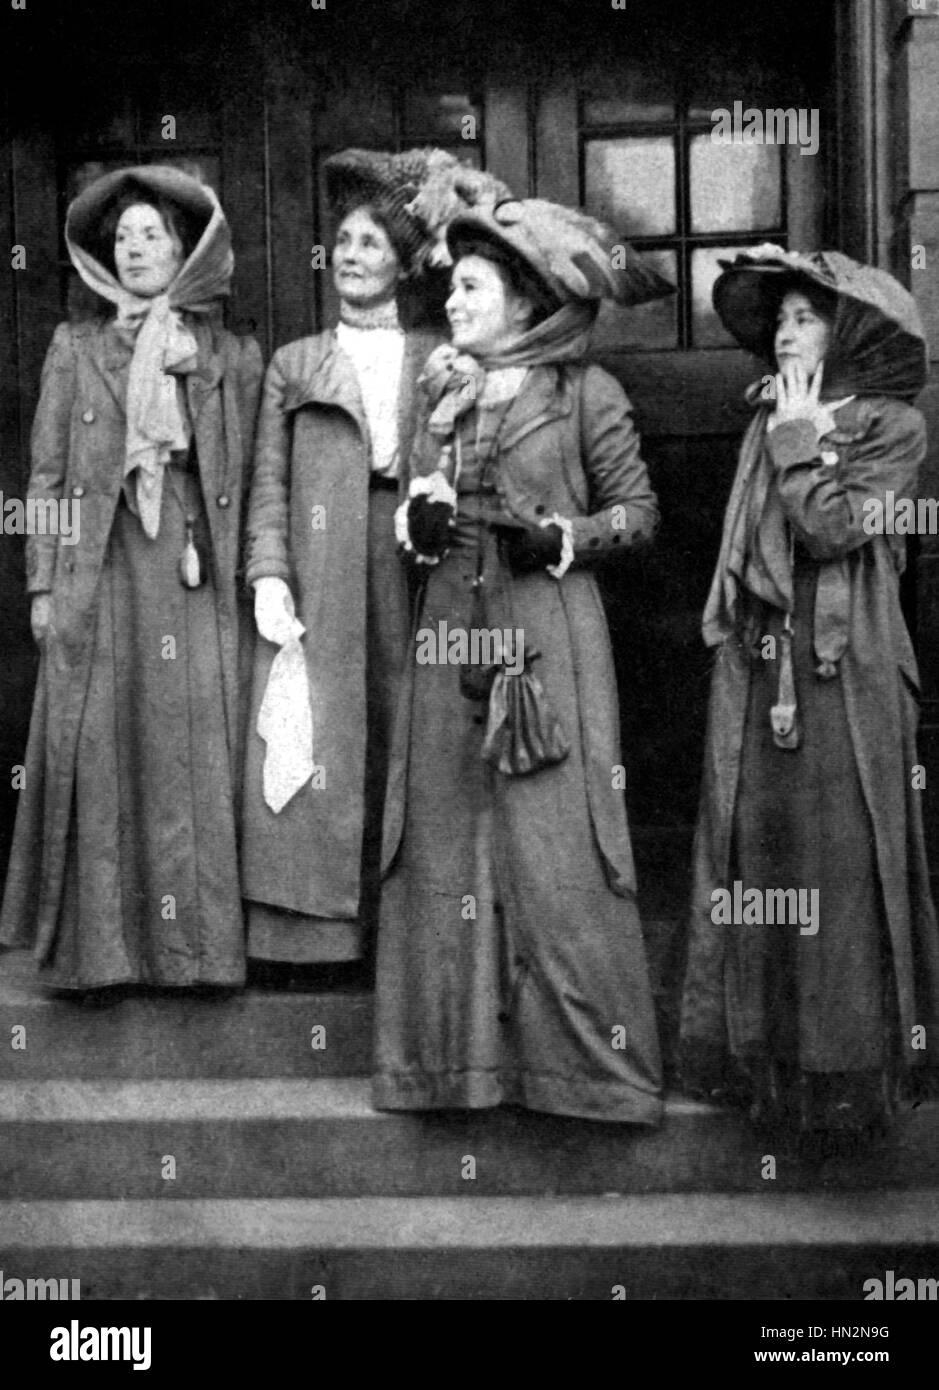 Hauptführer der Sufragettes. Von links nach rechts: Christabel Pankhurst, Frau Pankhurst, Pethick Lawrence, Adela Pankhurst. Anfang des 20. Jahrhunderts Stockfoto